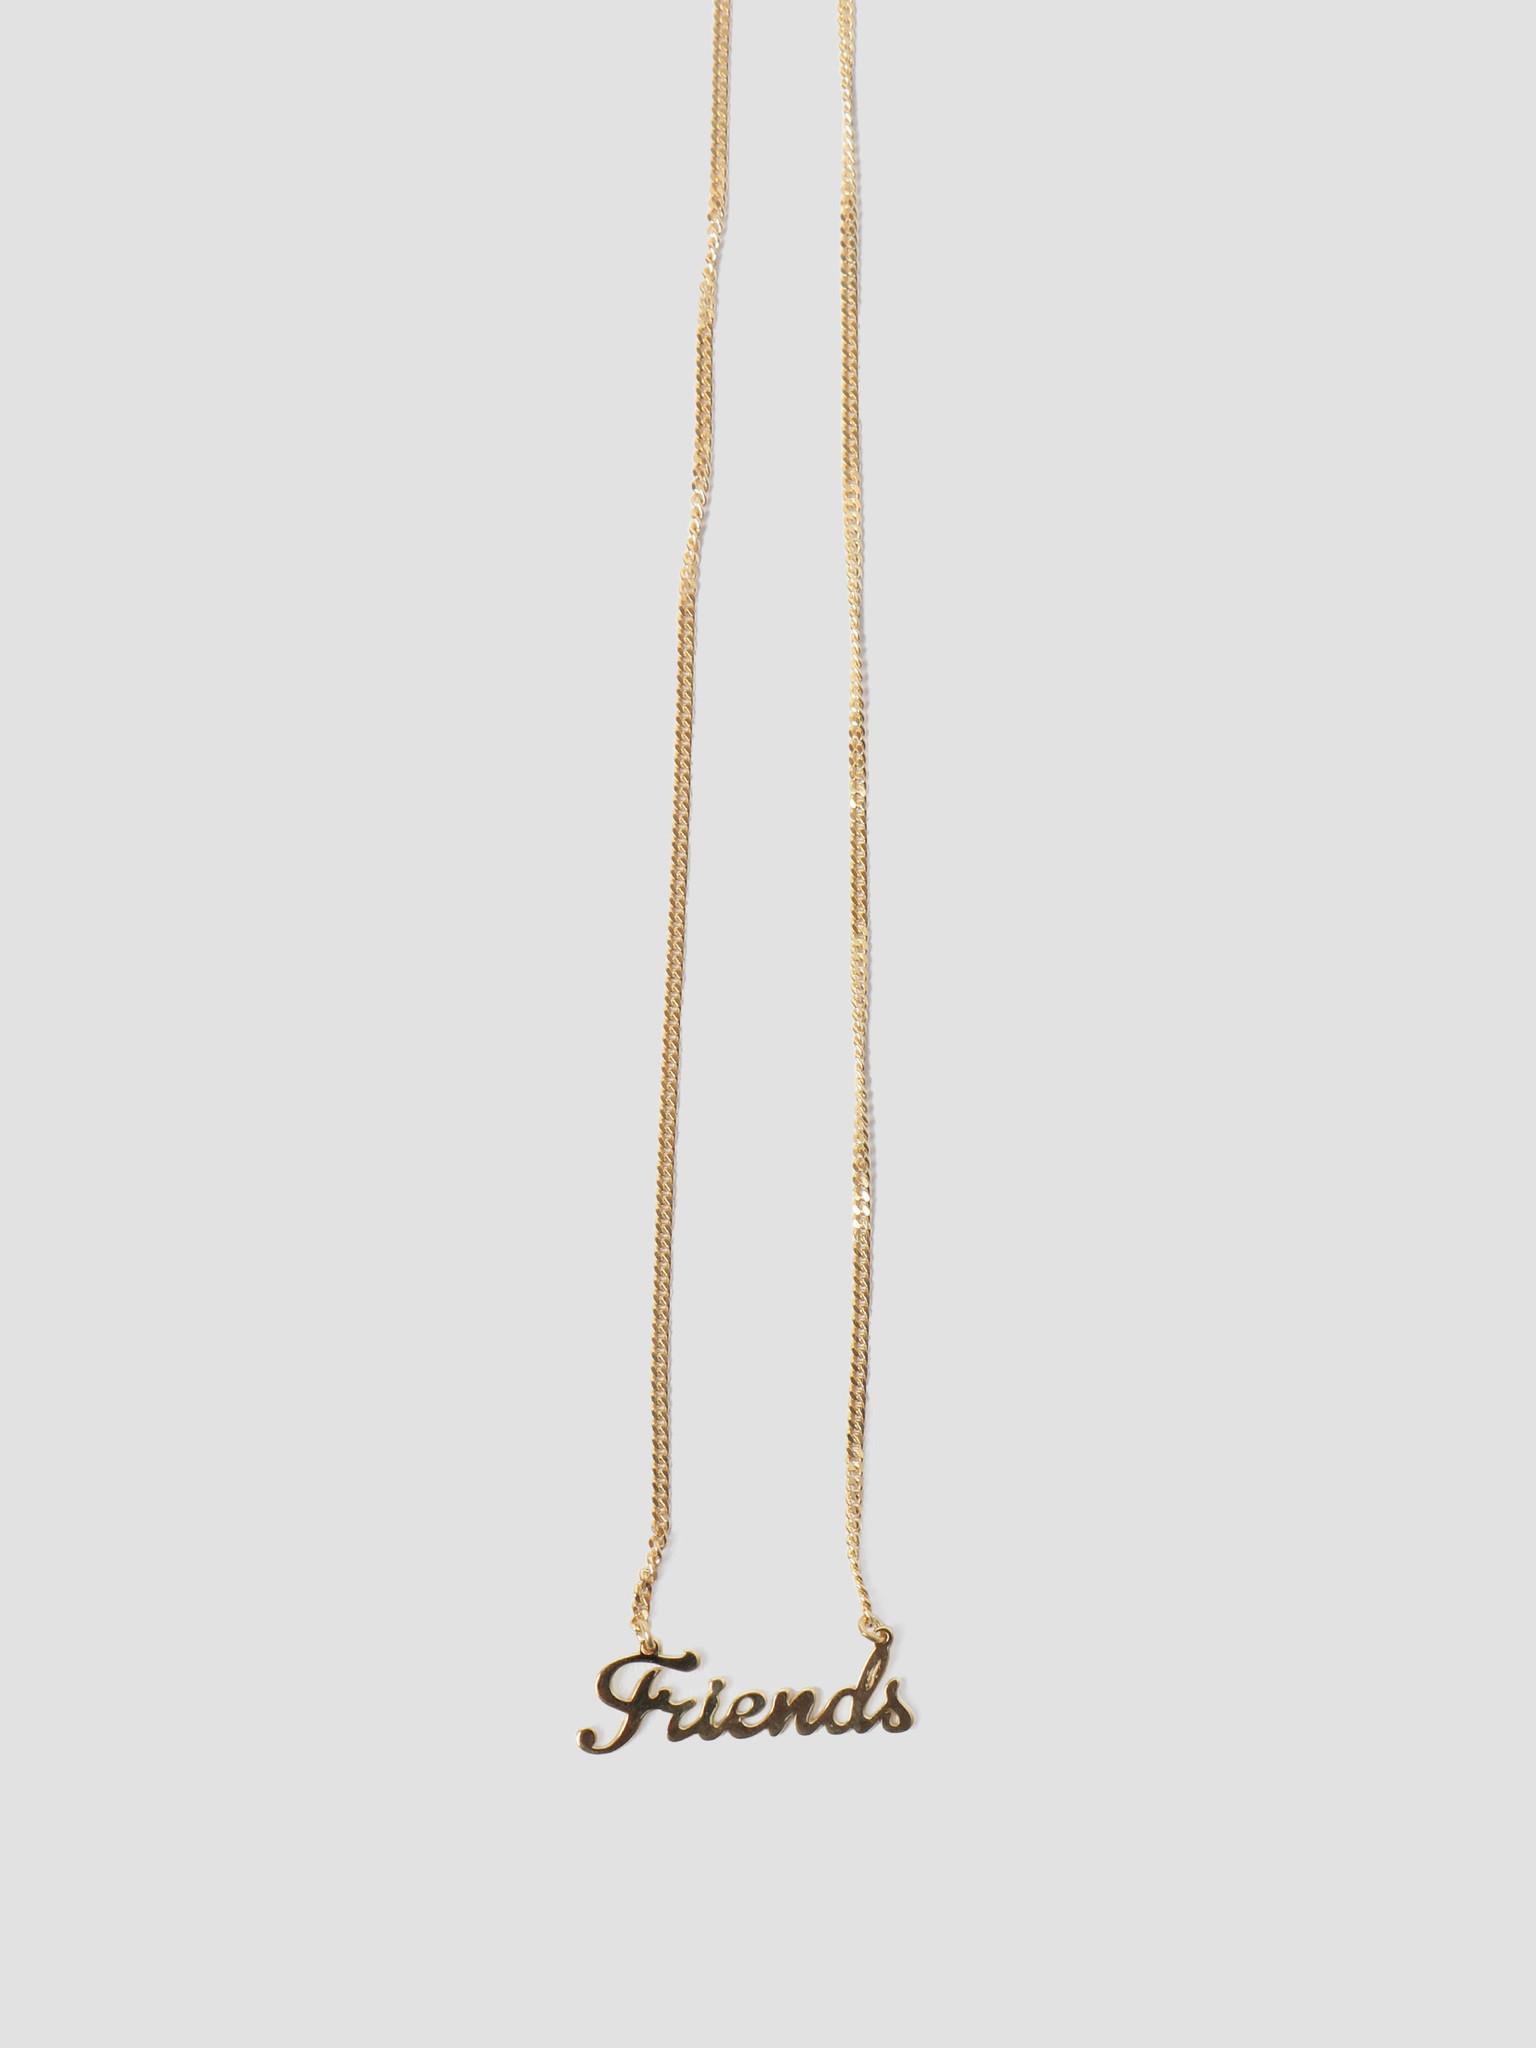 Golia Golia by Freshcotton Friends Necklace 55cm 14K gold plated